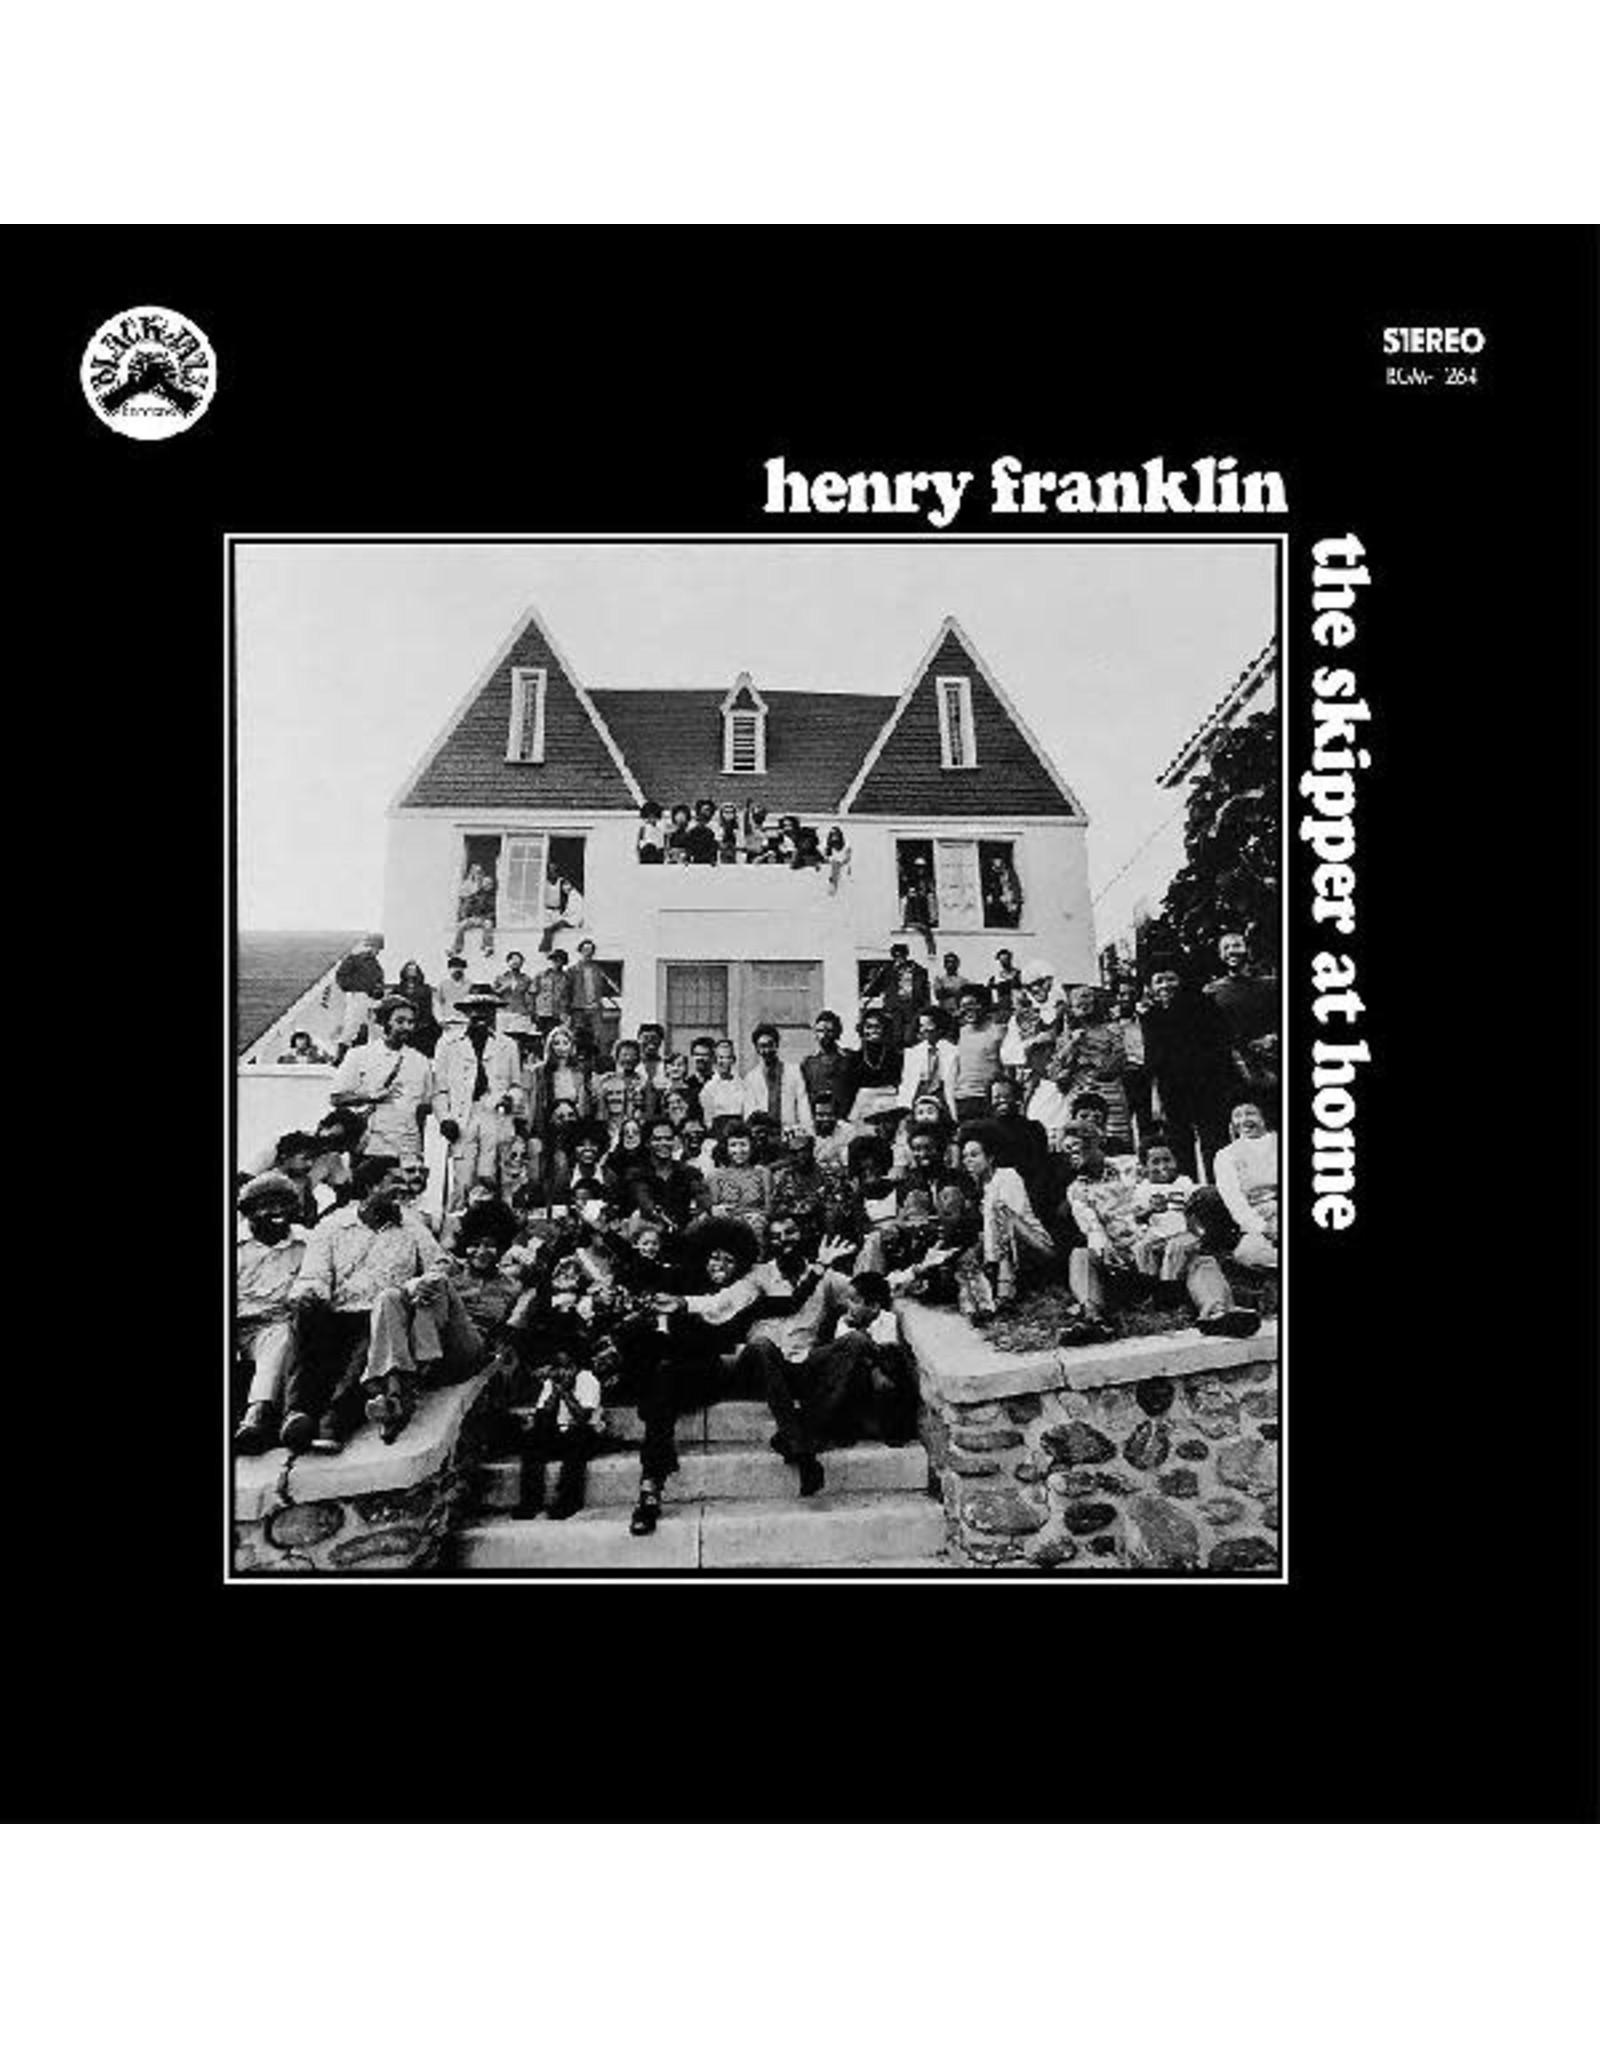 Real Gone Franklin, Henry: The Skipper at Home LP